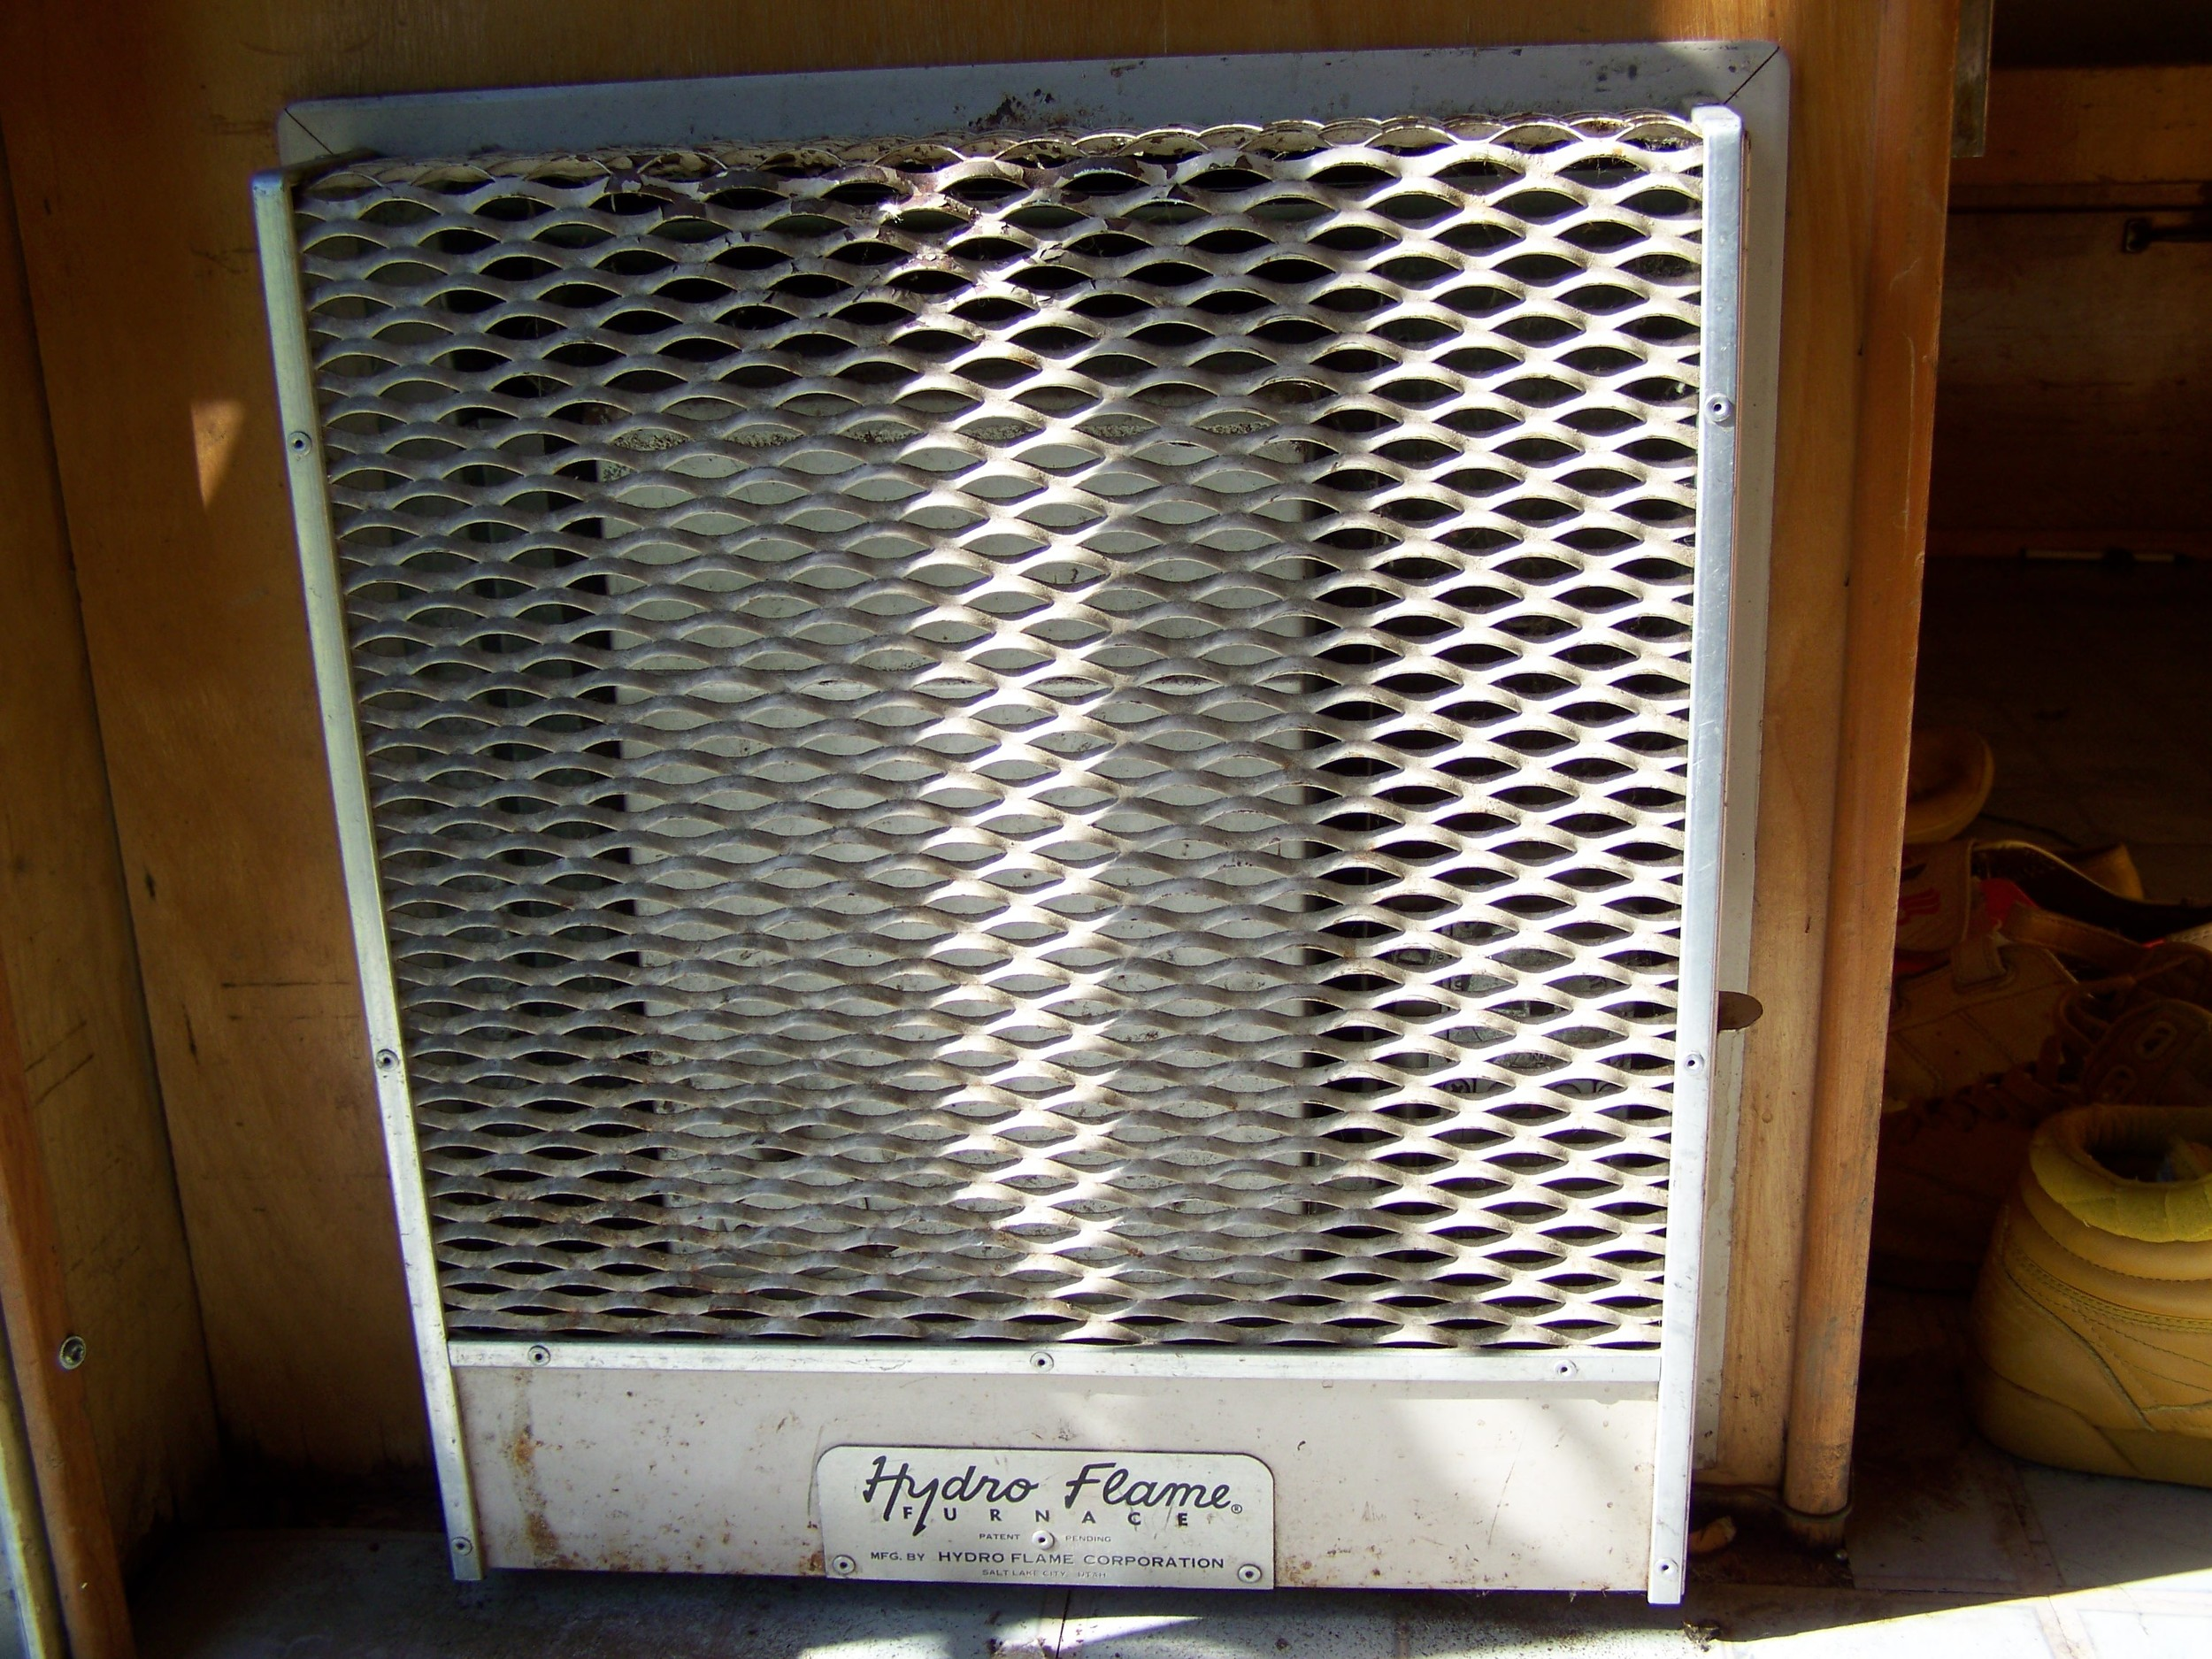 Hydro-Flame heater